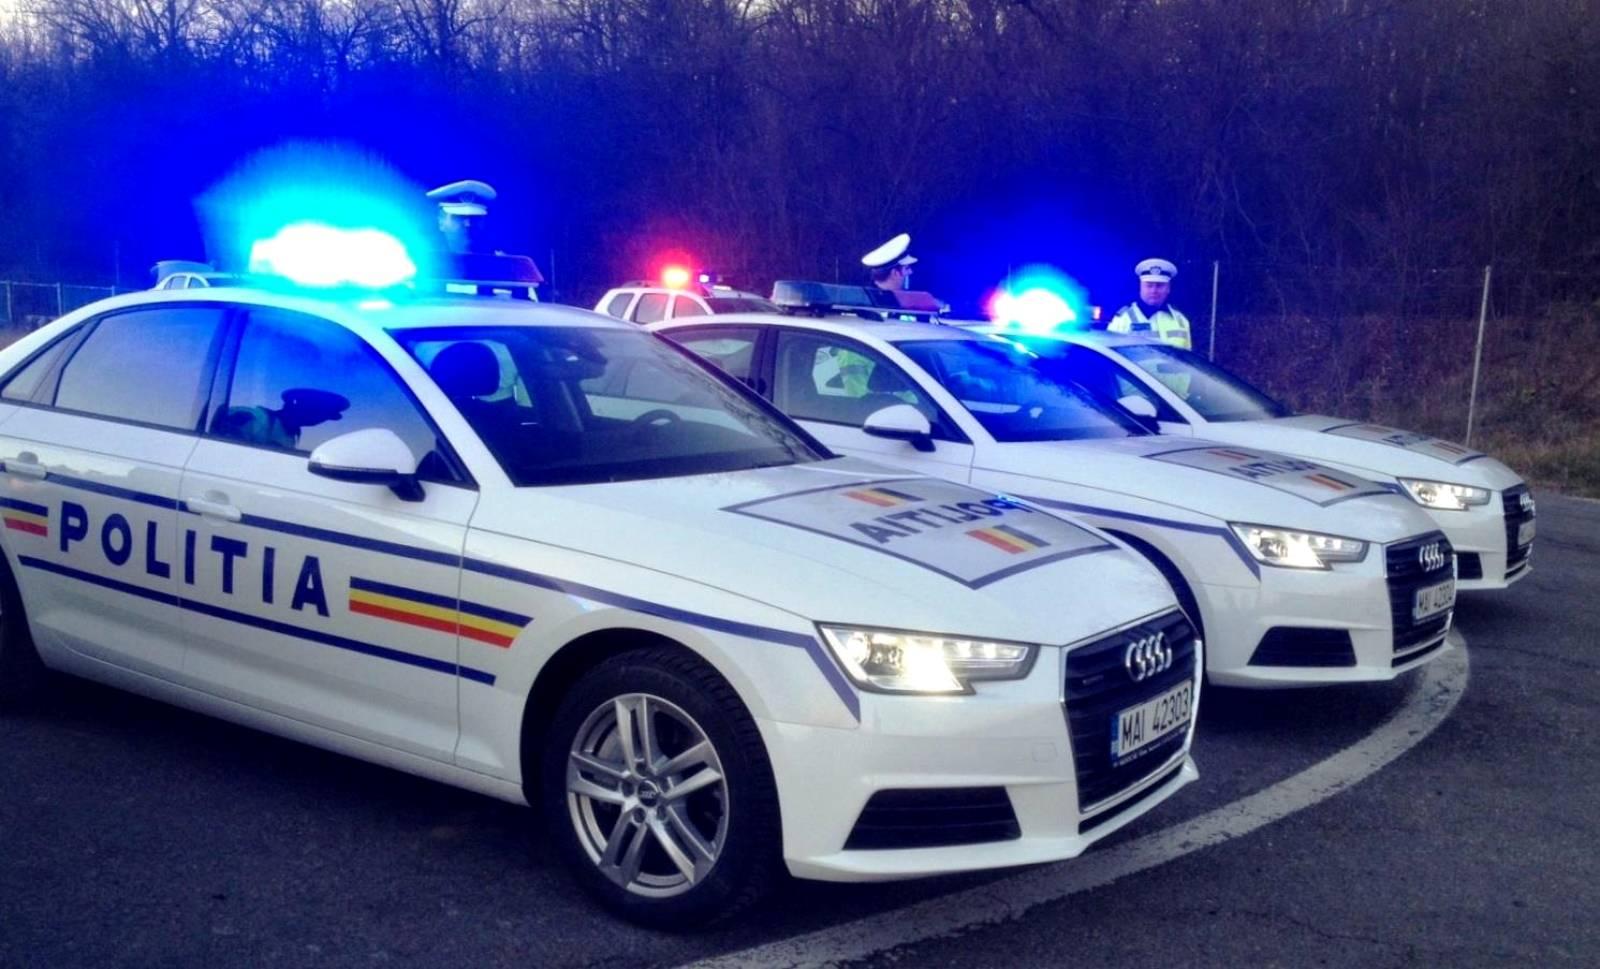 Politia Romana ancheta phishing